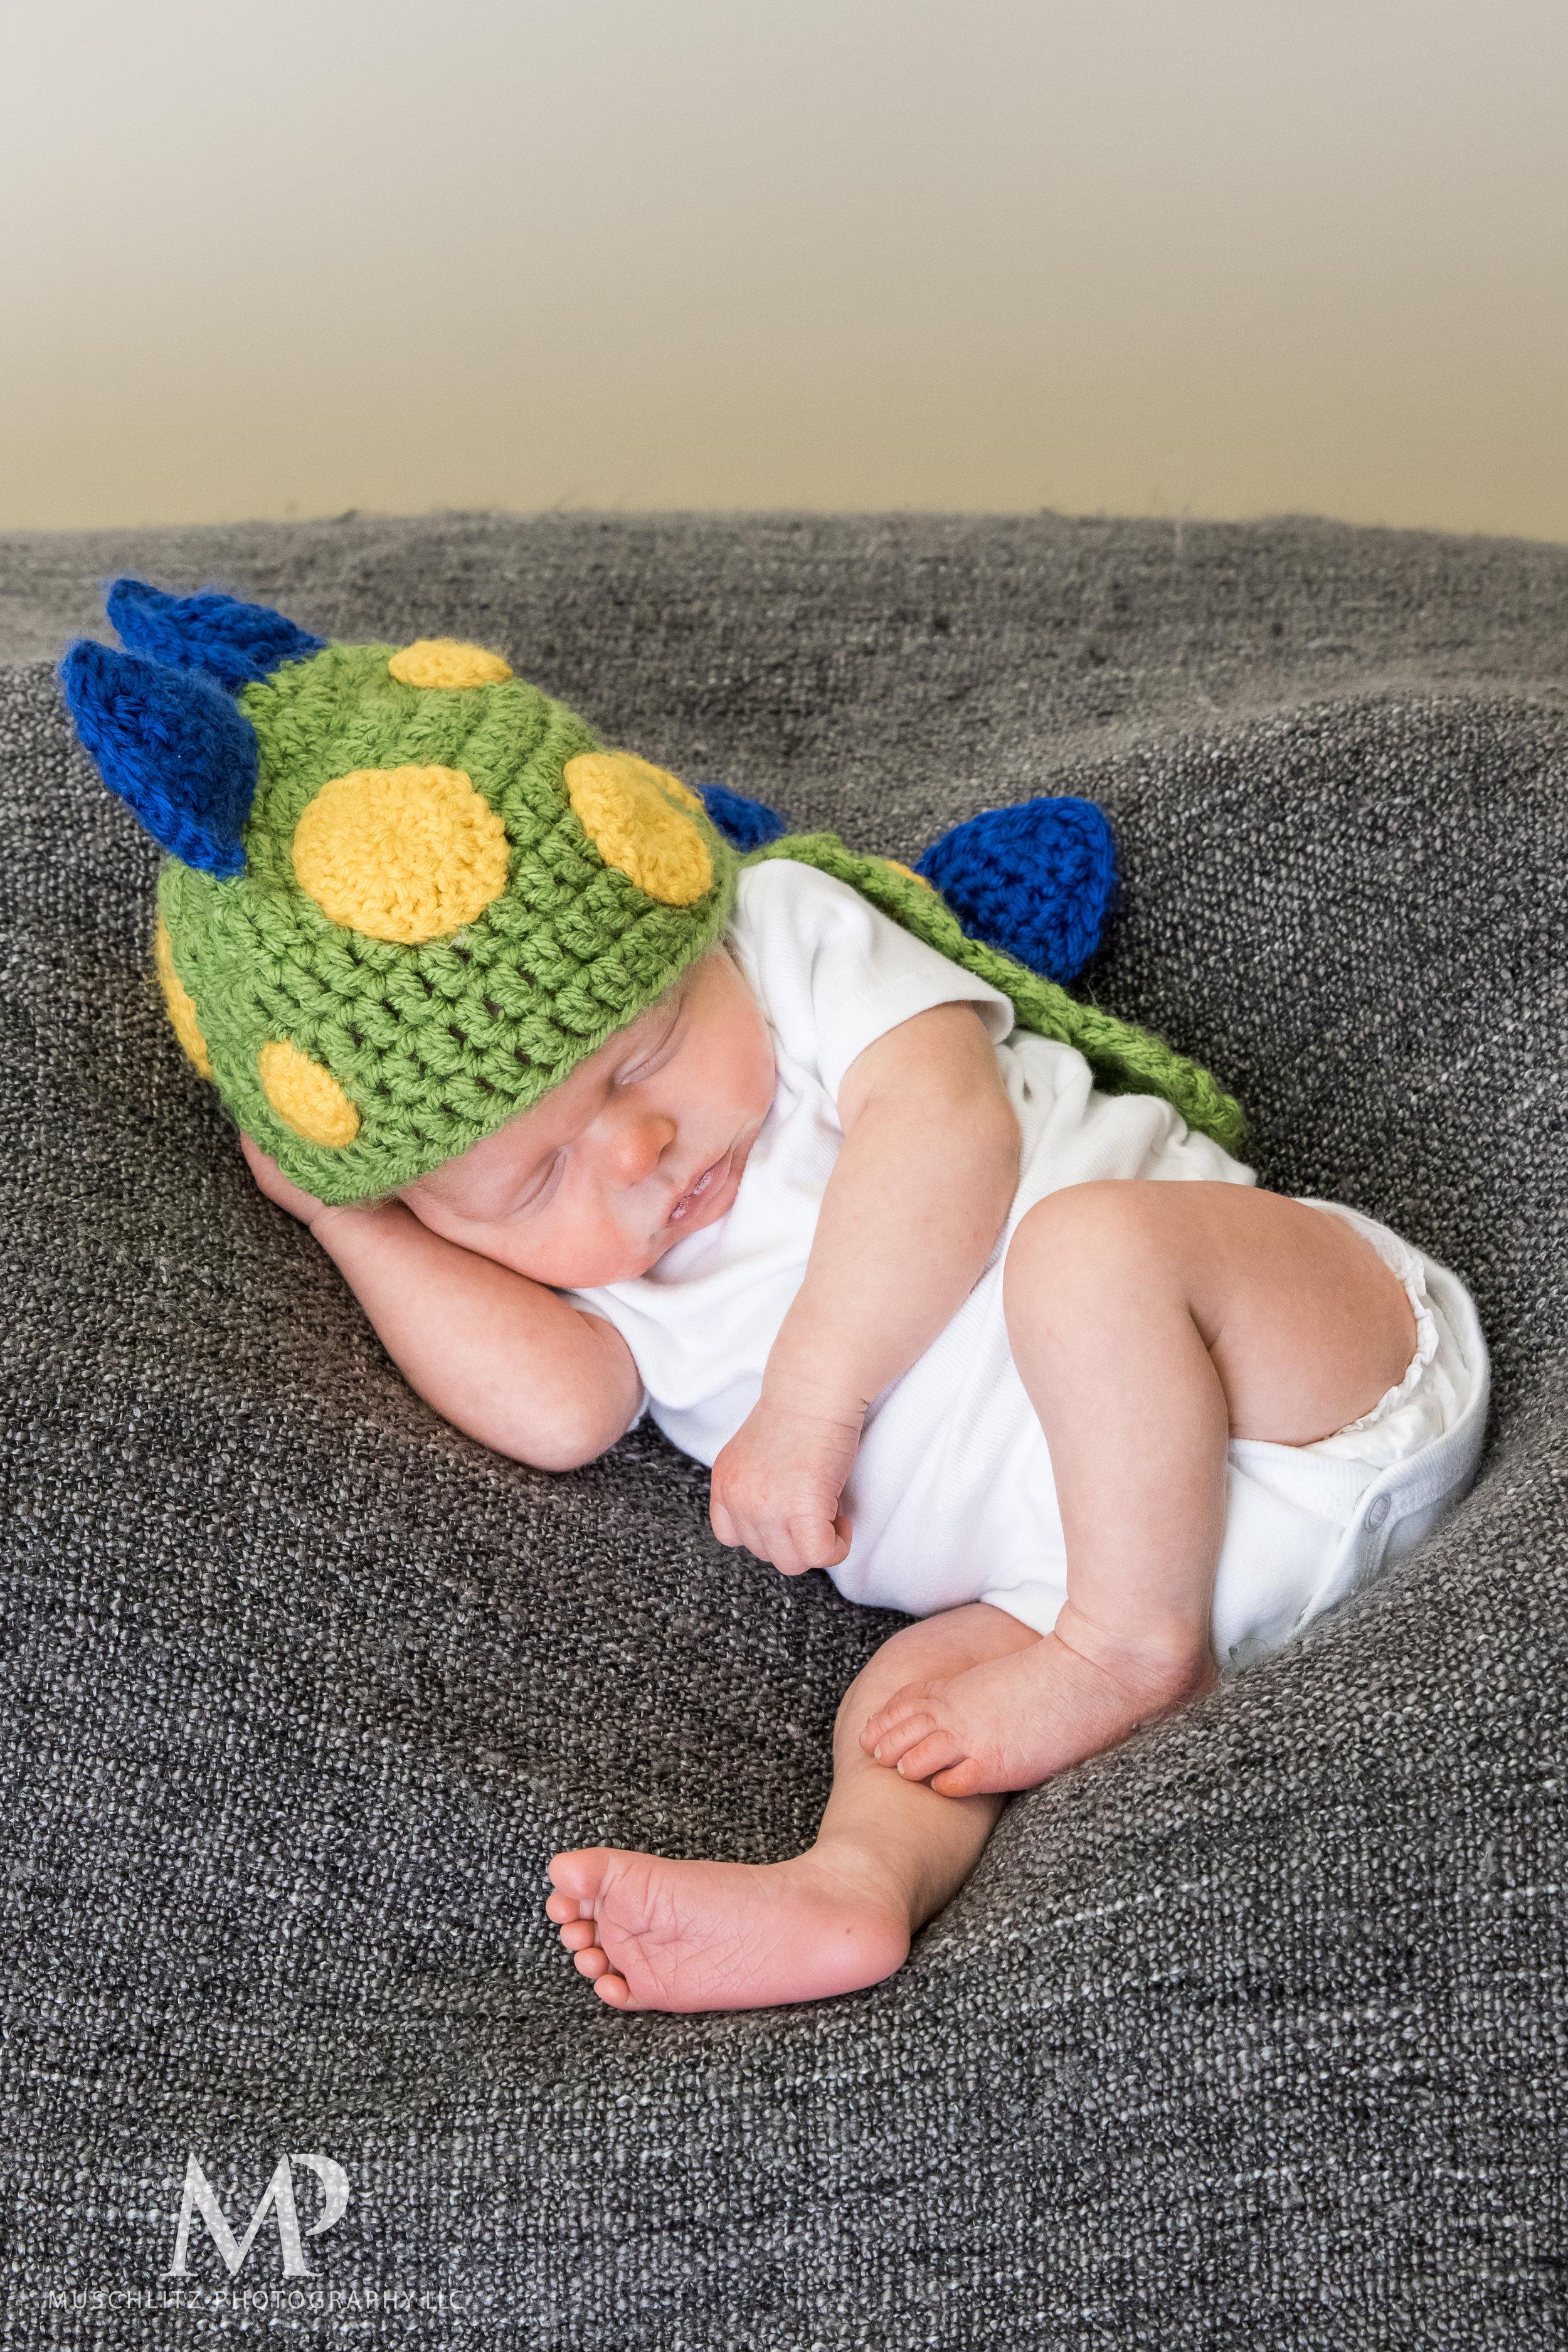 newborn-baby-portraits-photos-studio-holiday-columbus-gahanna-ohio-muschlitz-photography-028.JPG